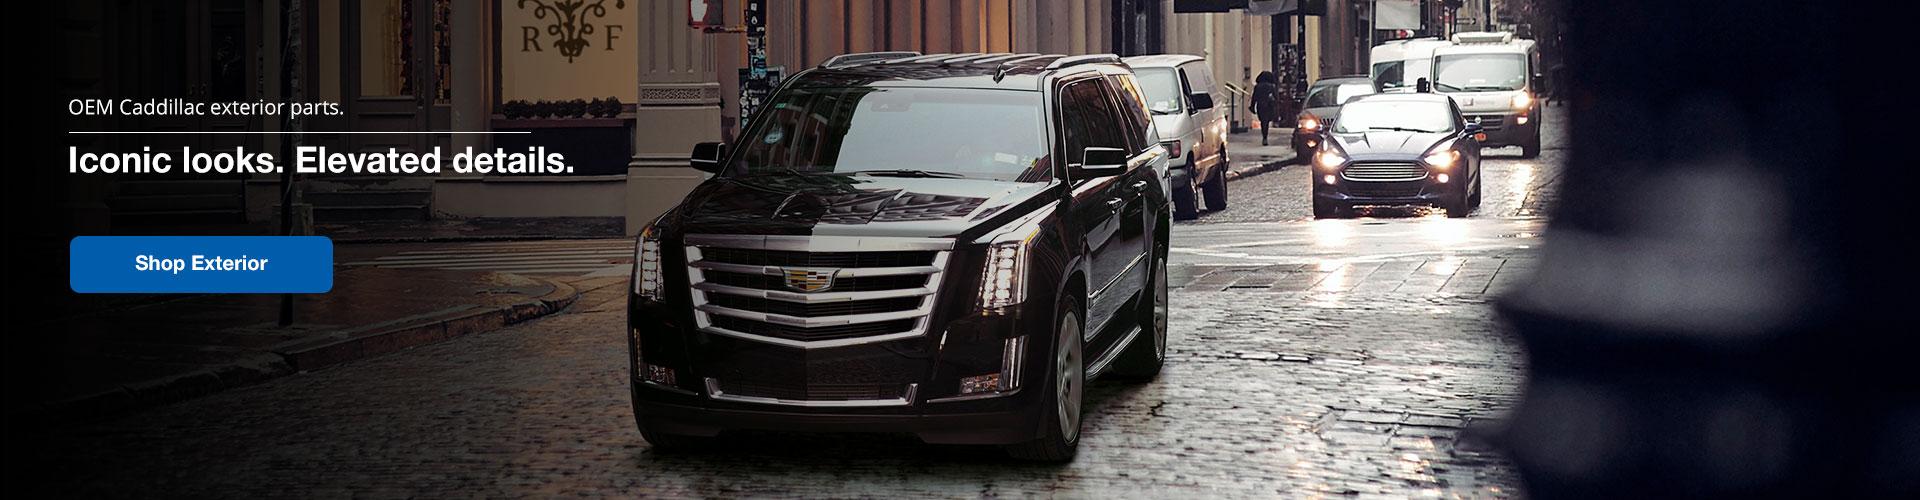 Cadillac Exterior Parts